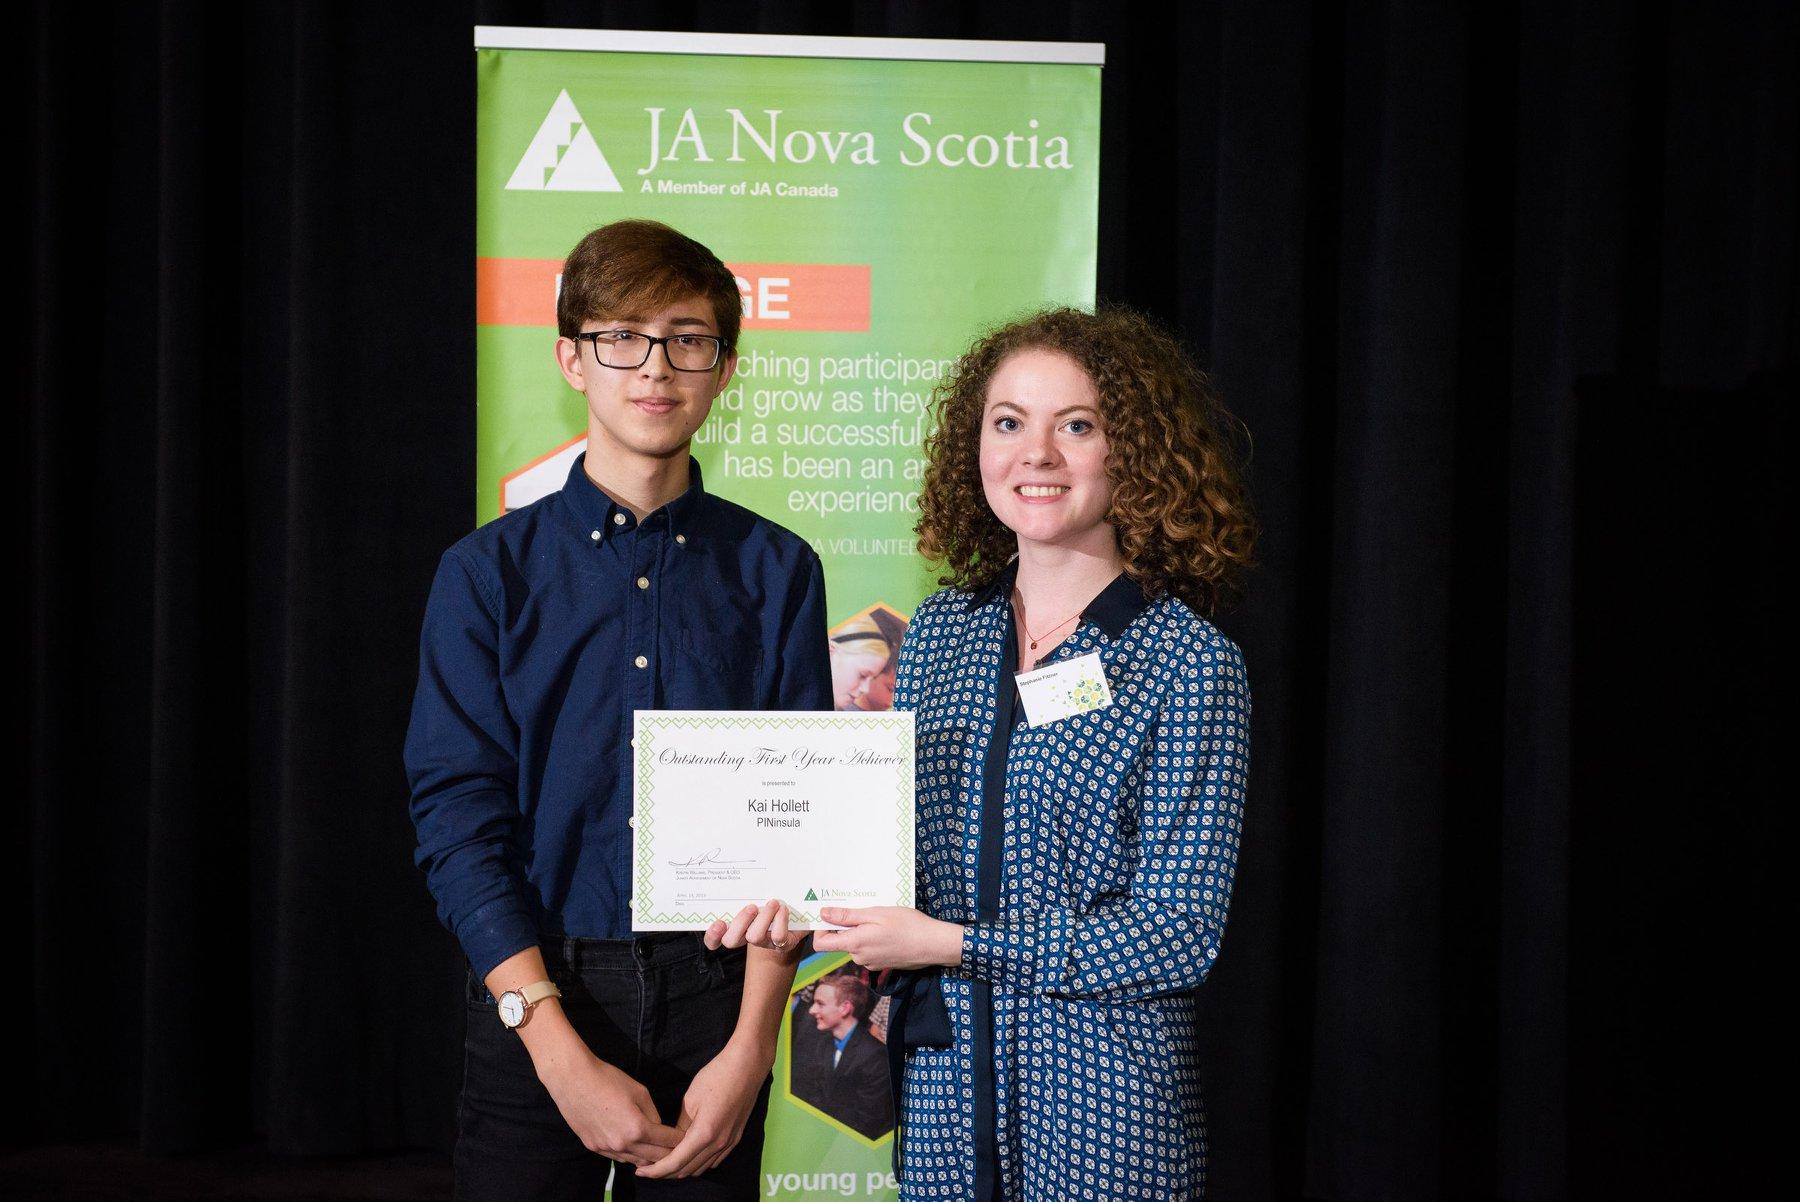 2014 Annual Awards & Recognition   Photo Credit: Rebecca Clarke Emotive Photography, rebeccaclarke.ca